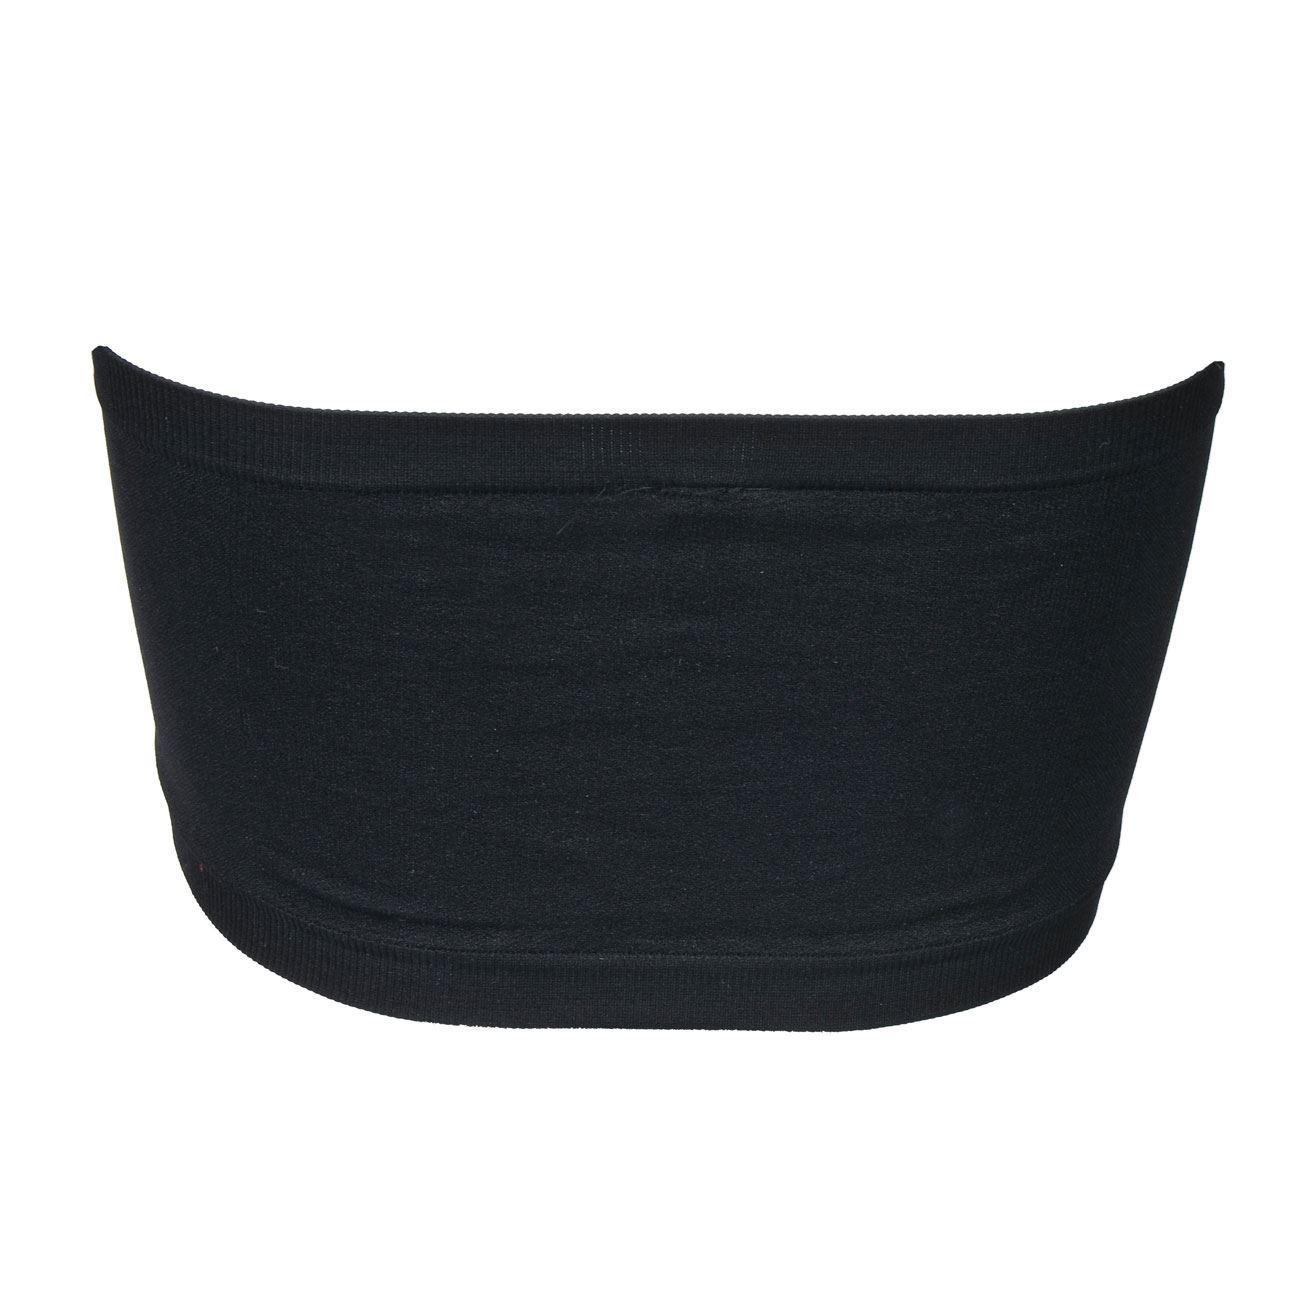 a033c6f448e4 Εσώρουχο Γυναικείο Τοπ Seamless Ενίσχυση Μαύρο - One Size ...